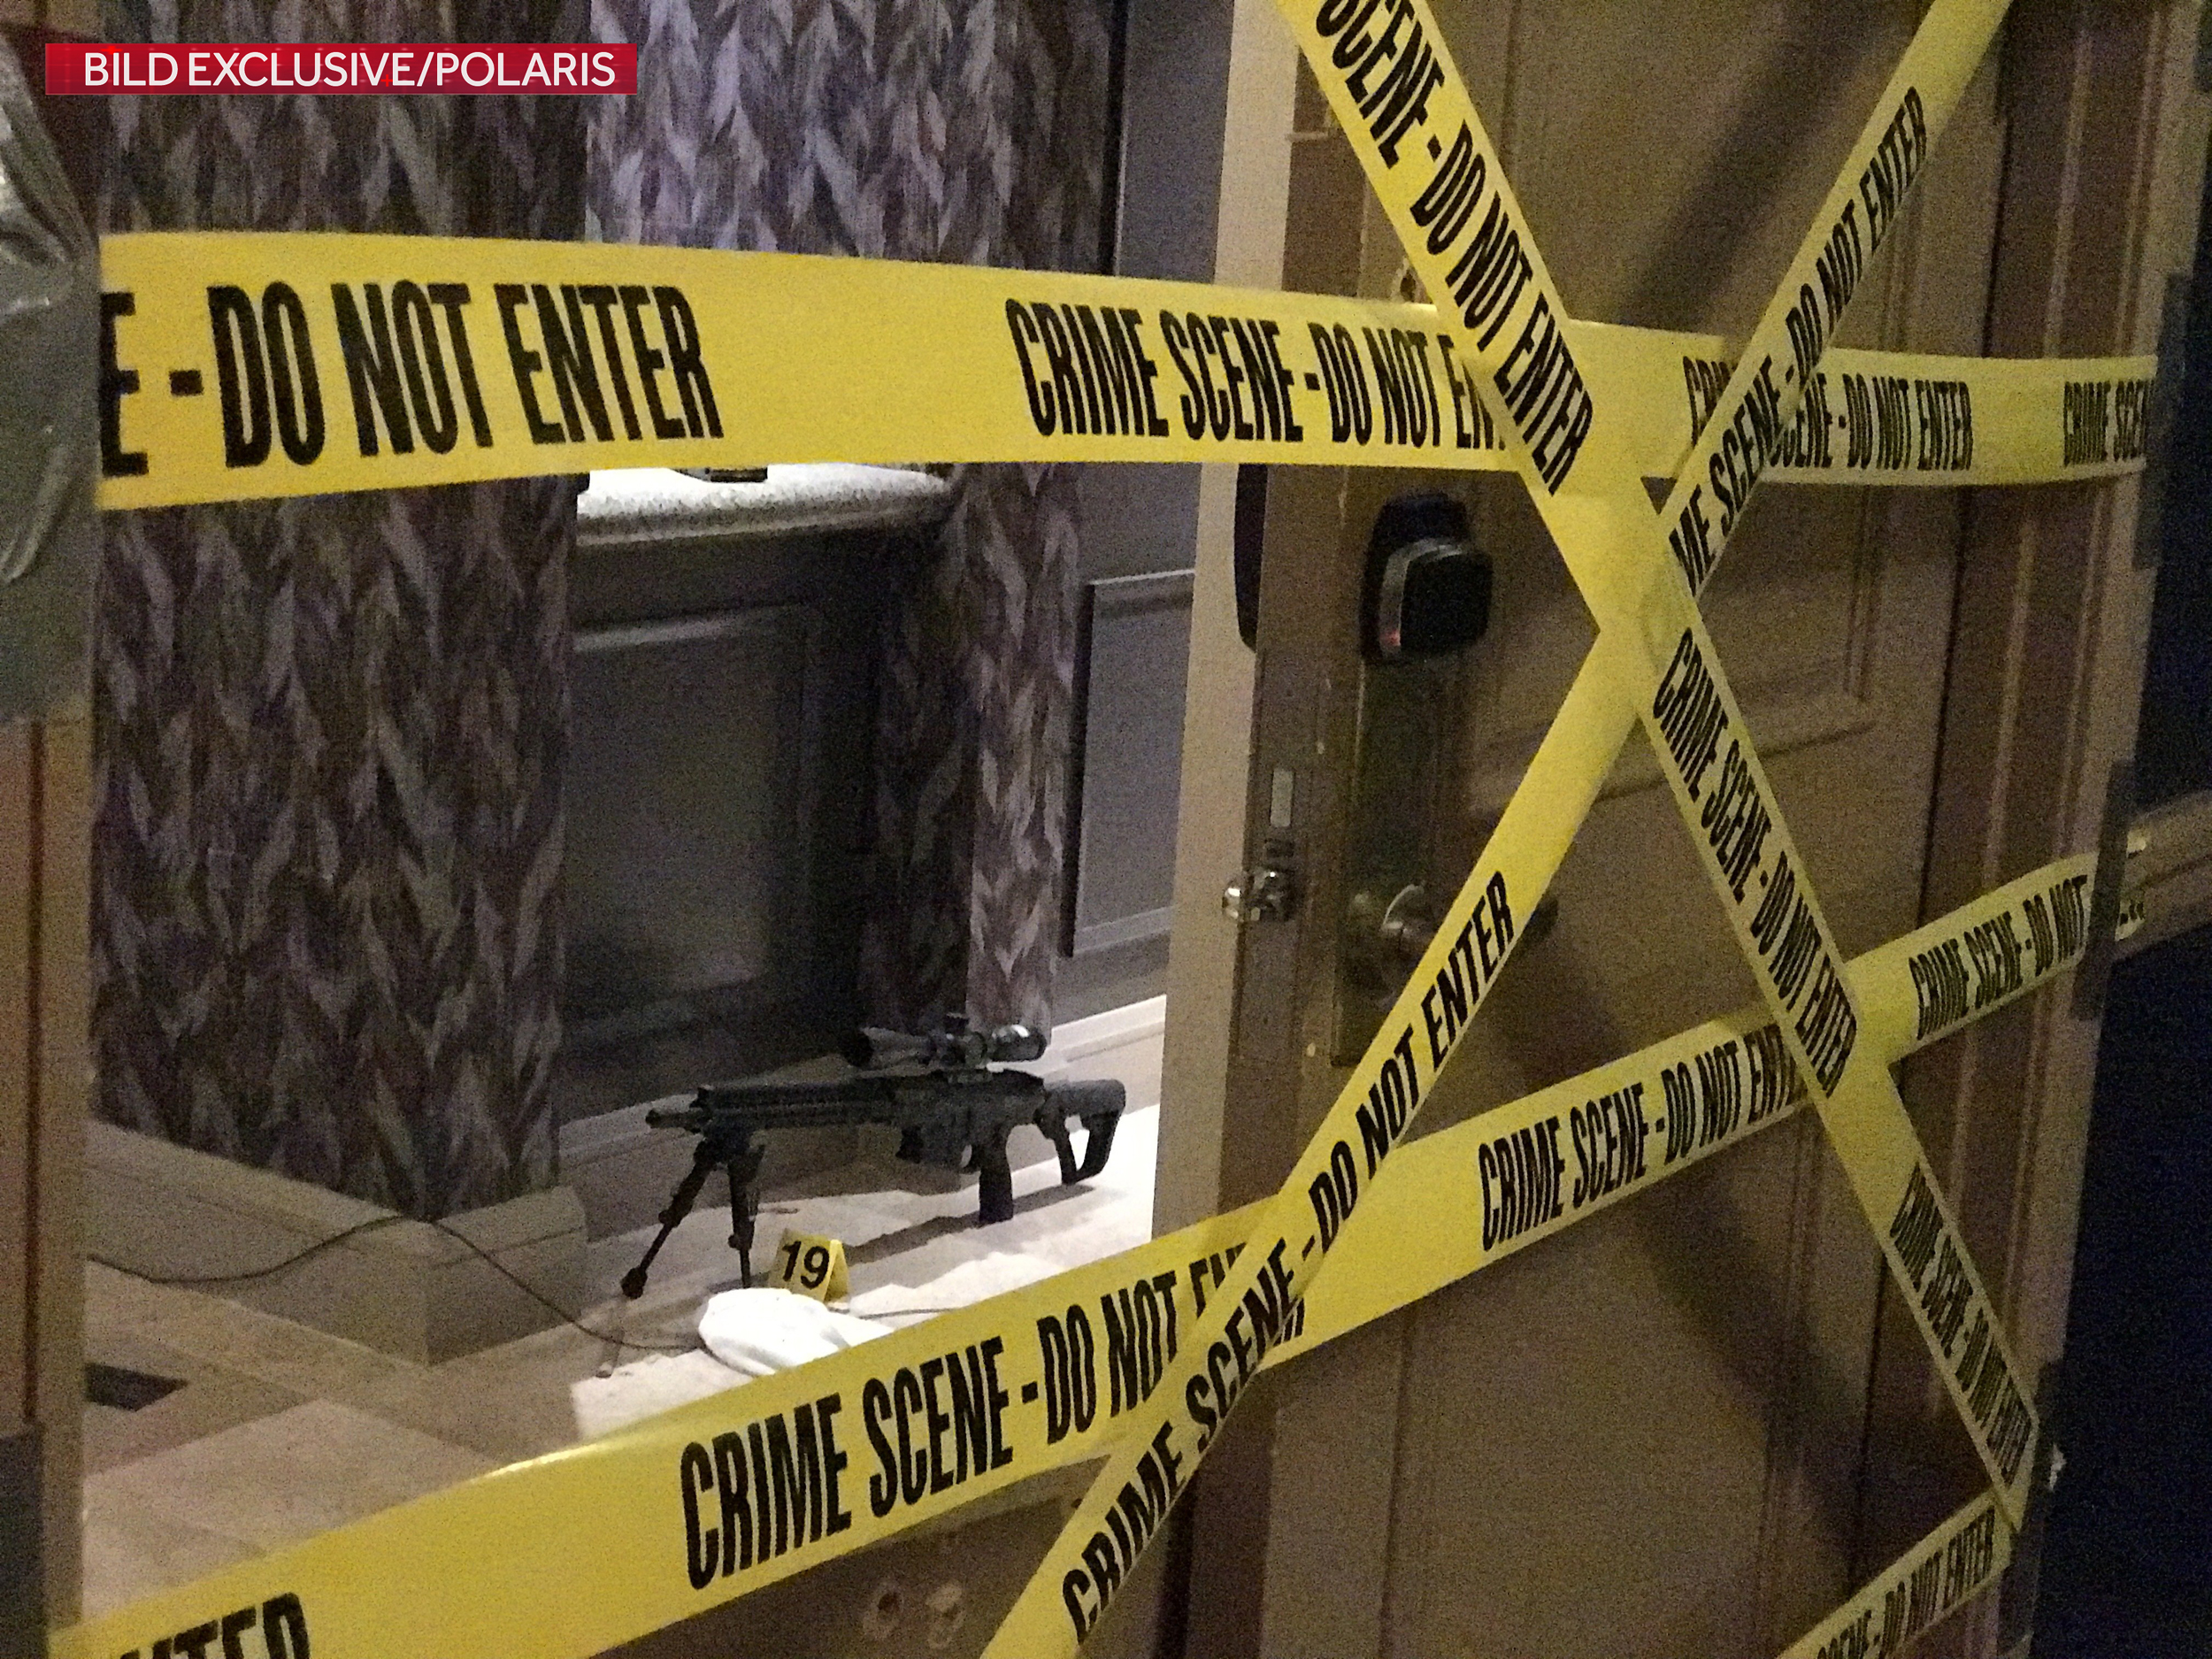 Image: Las Vegas gunman's hotel room